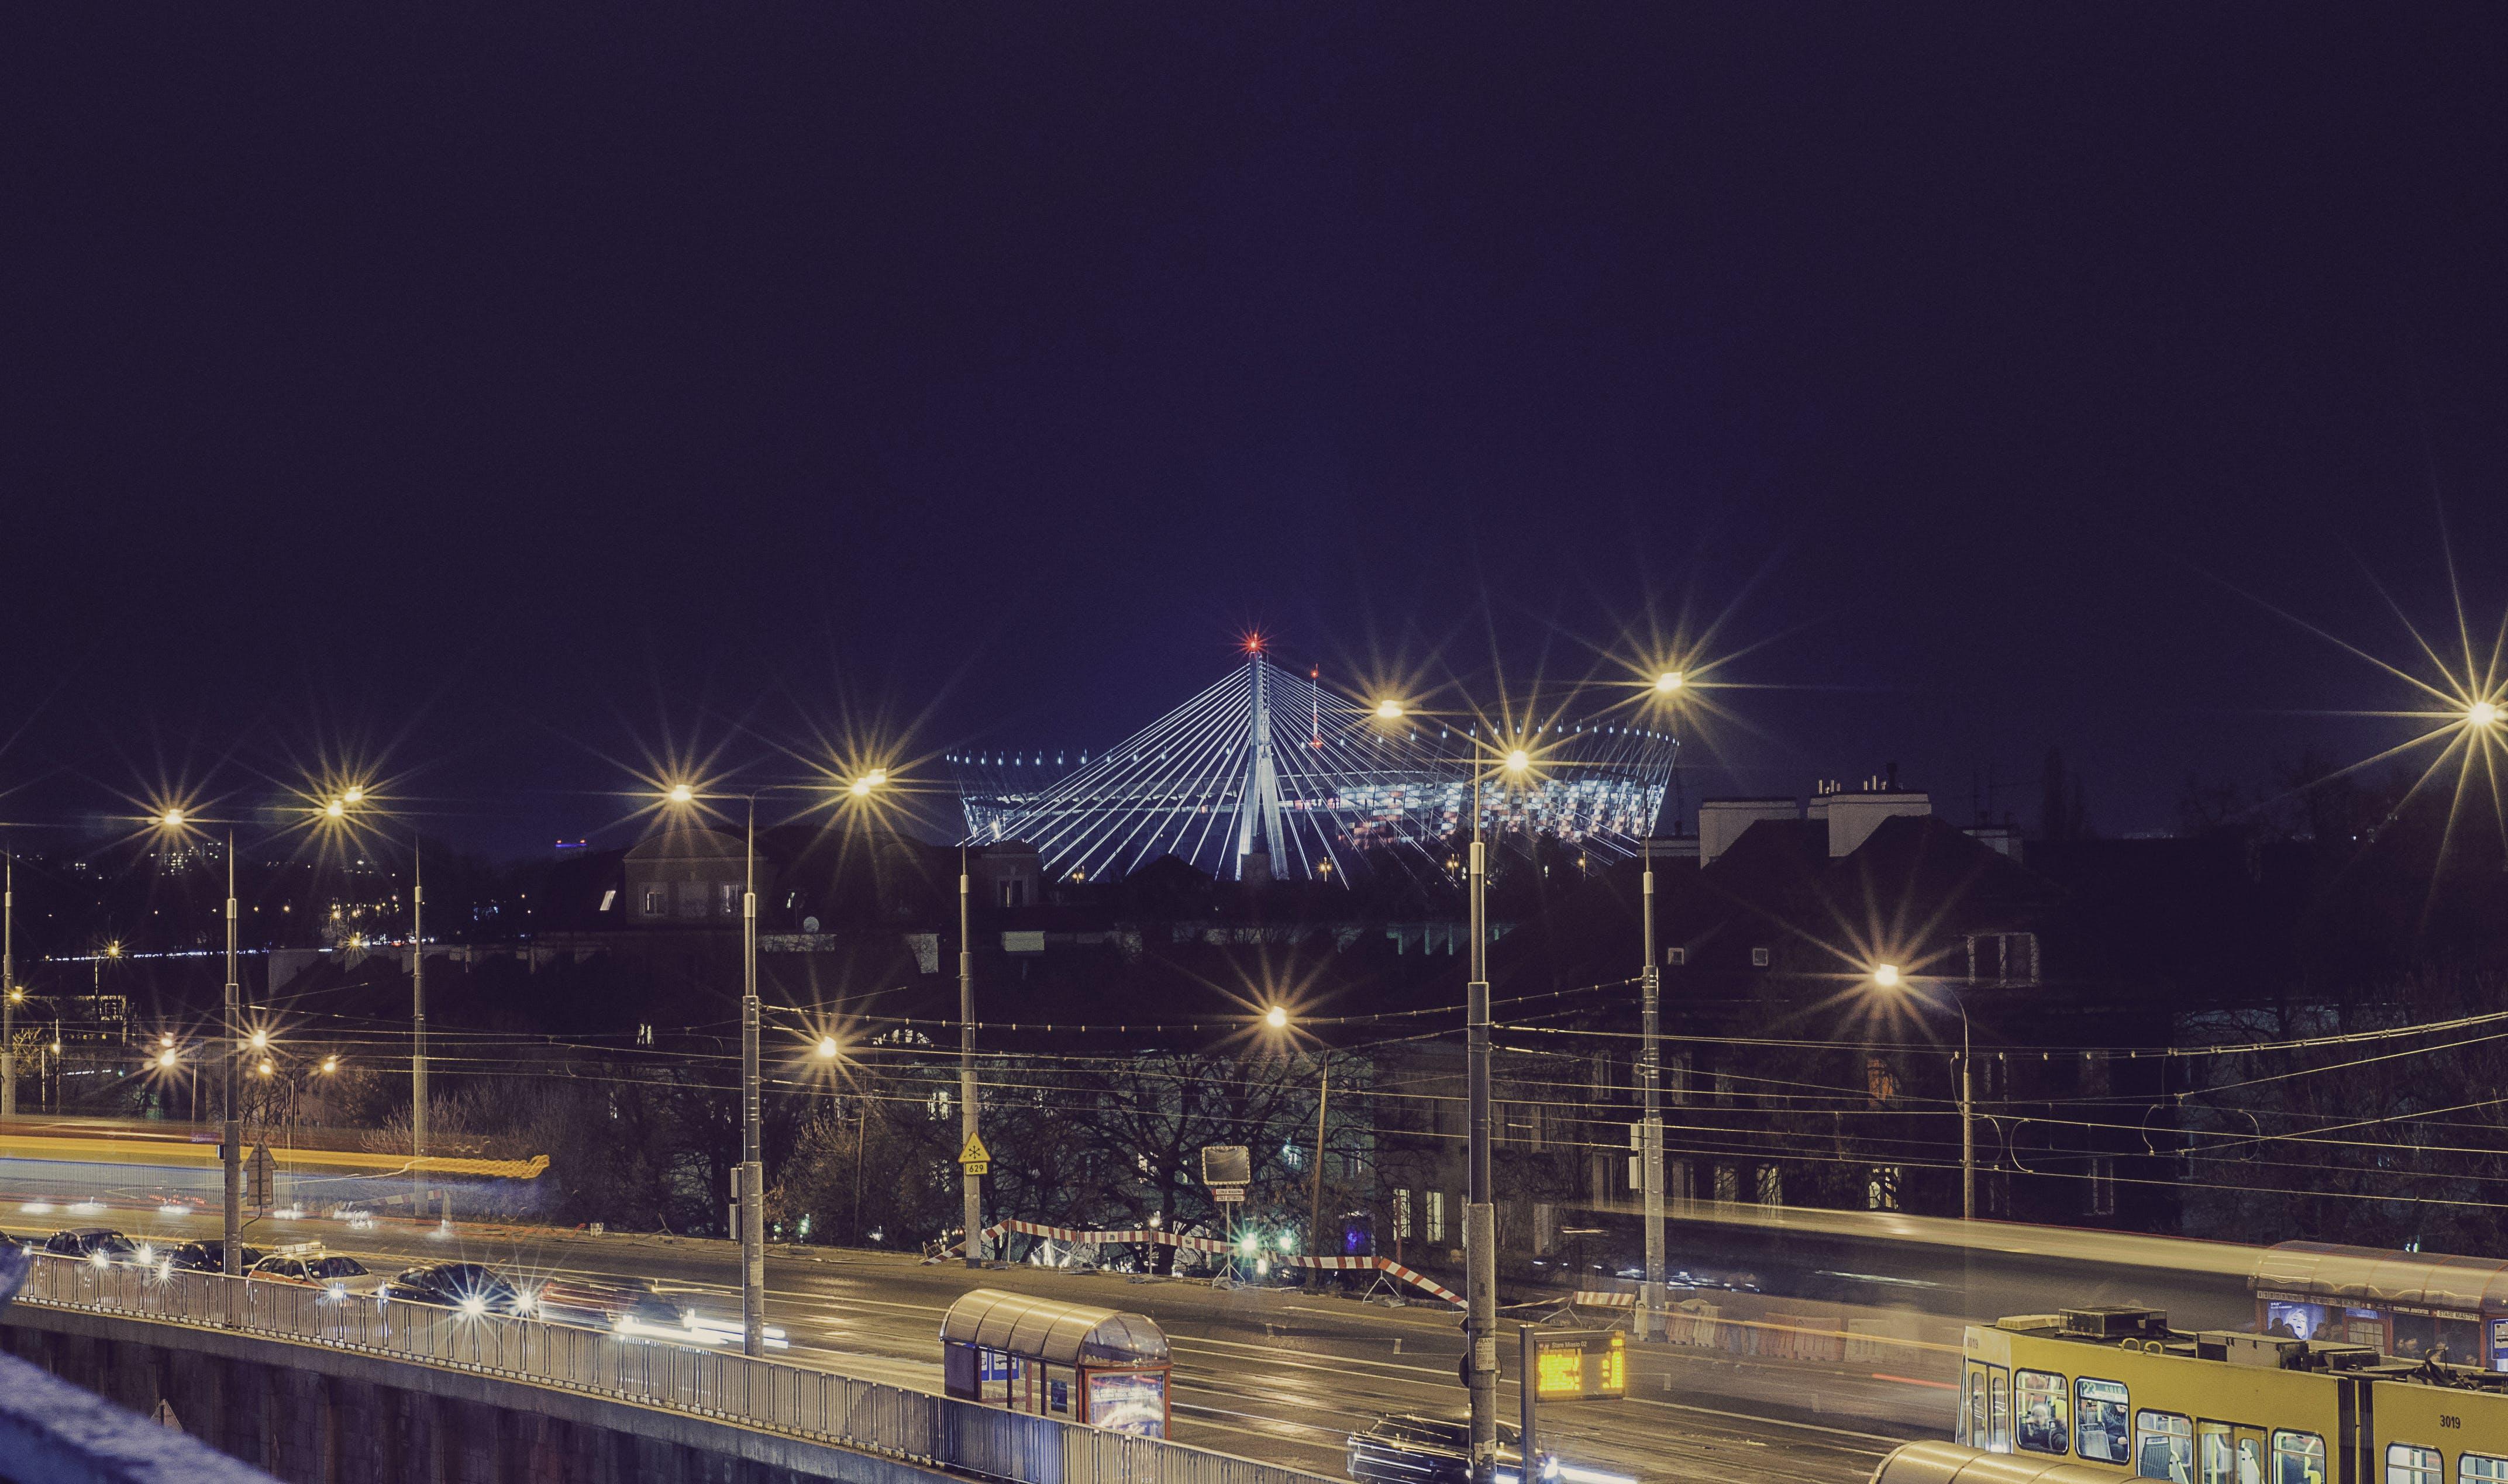 Warsaw Night Street